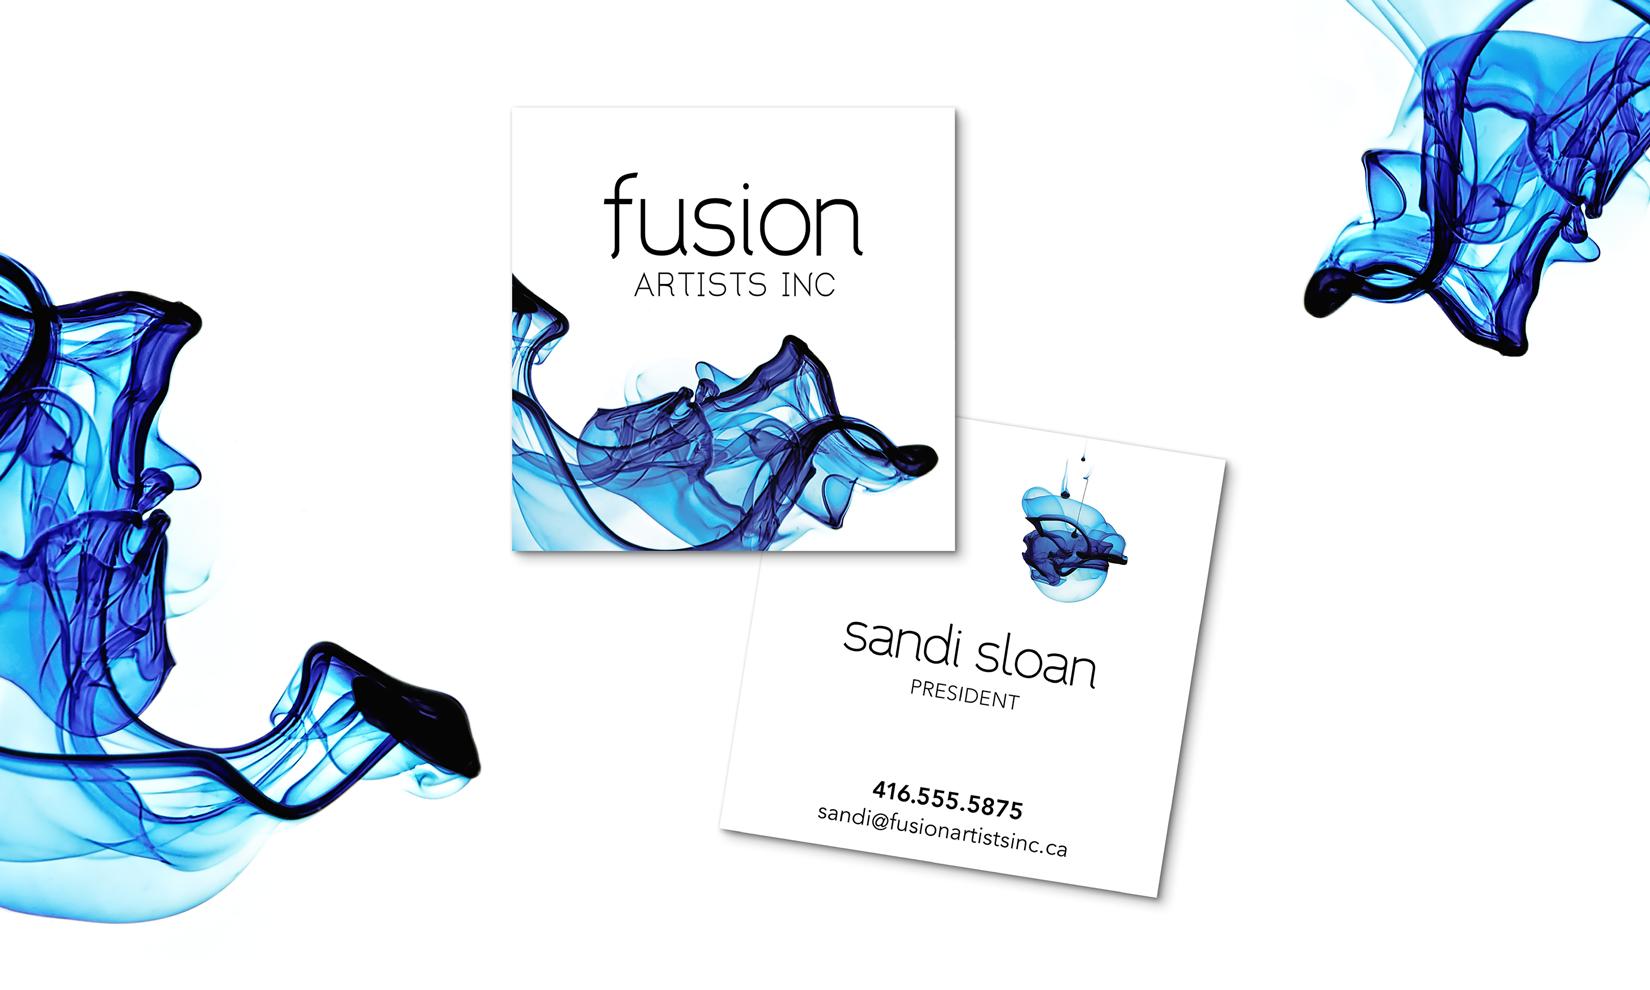 Personal brand design creative professionals - Fusion Artists